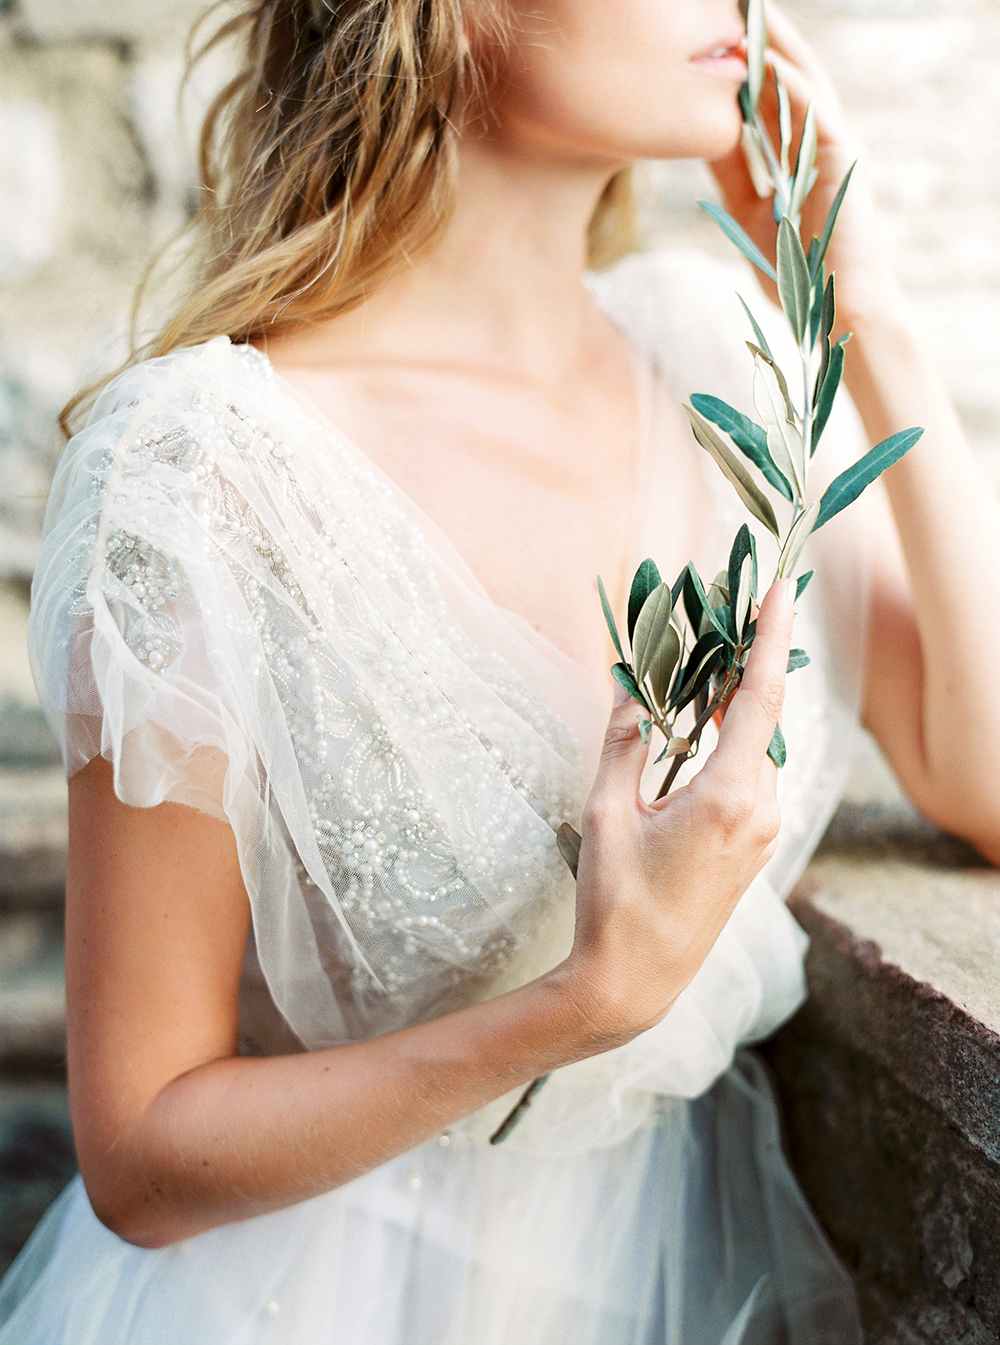 Olga_Plakitina_Photography_033.jpg